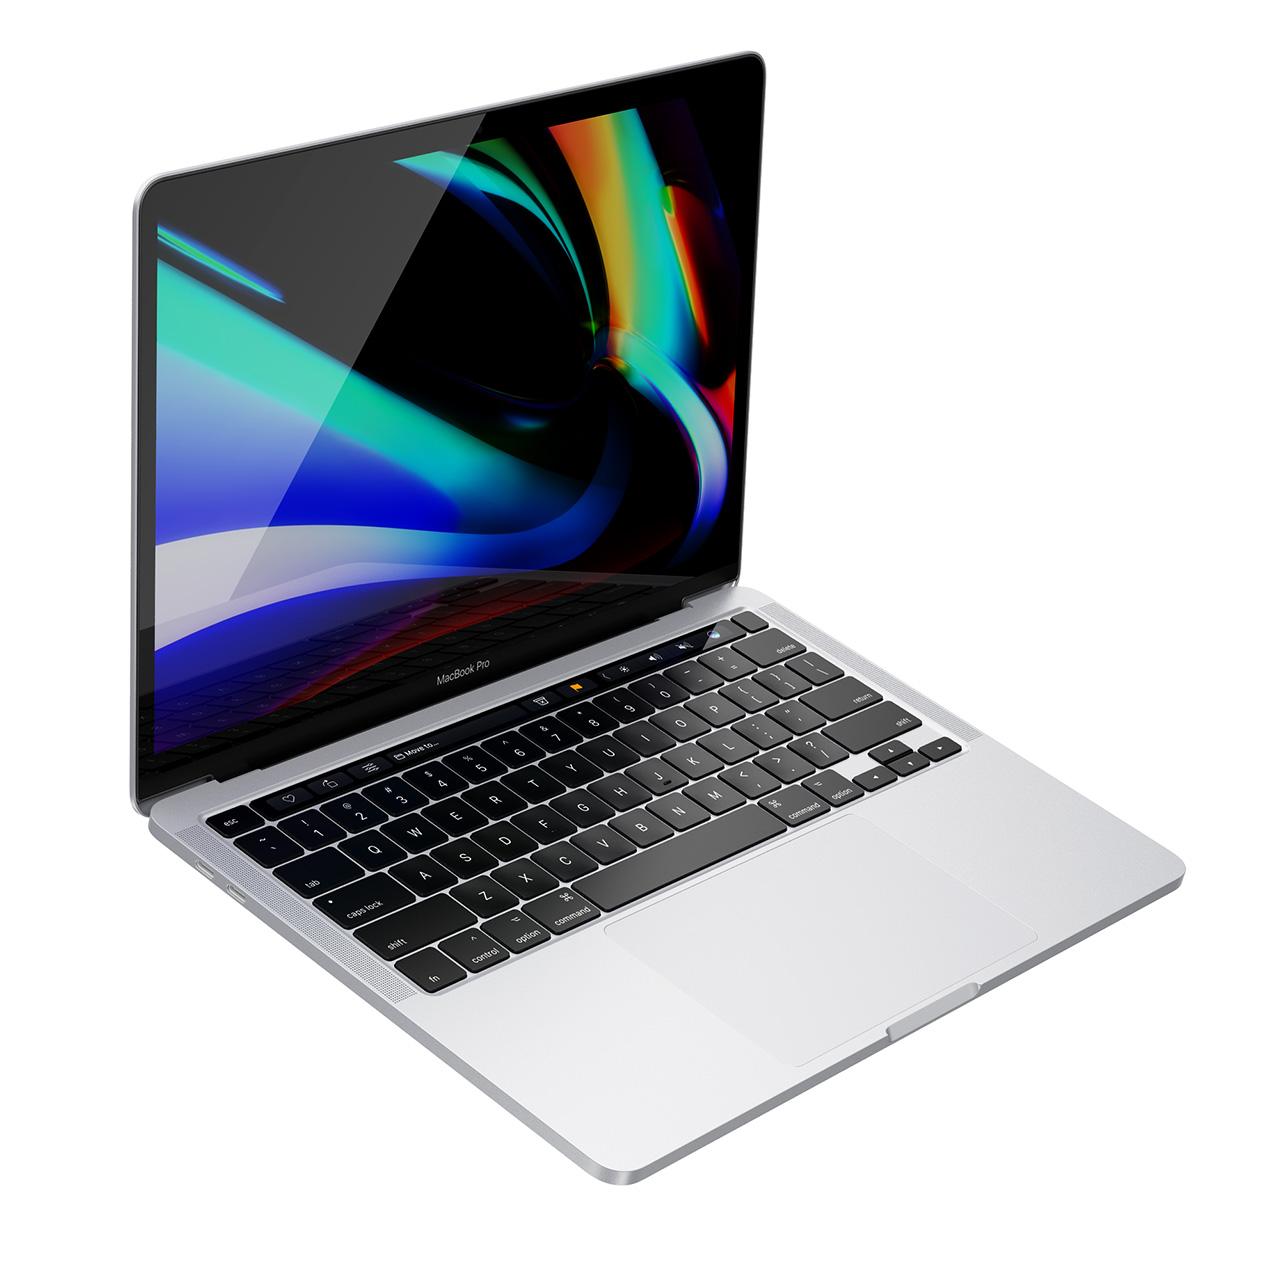 MacBook Pro 13-inch Laptop by Apple - Dimensiva | 3d models